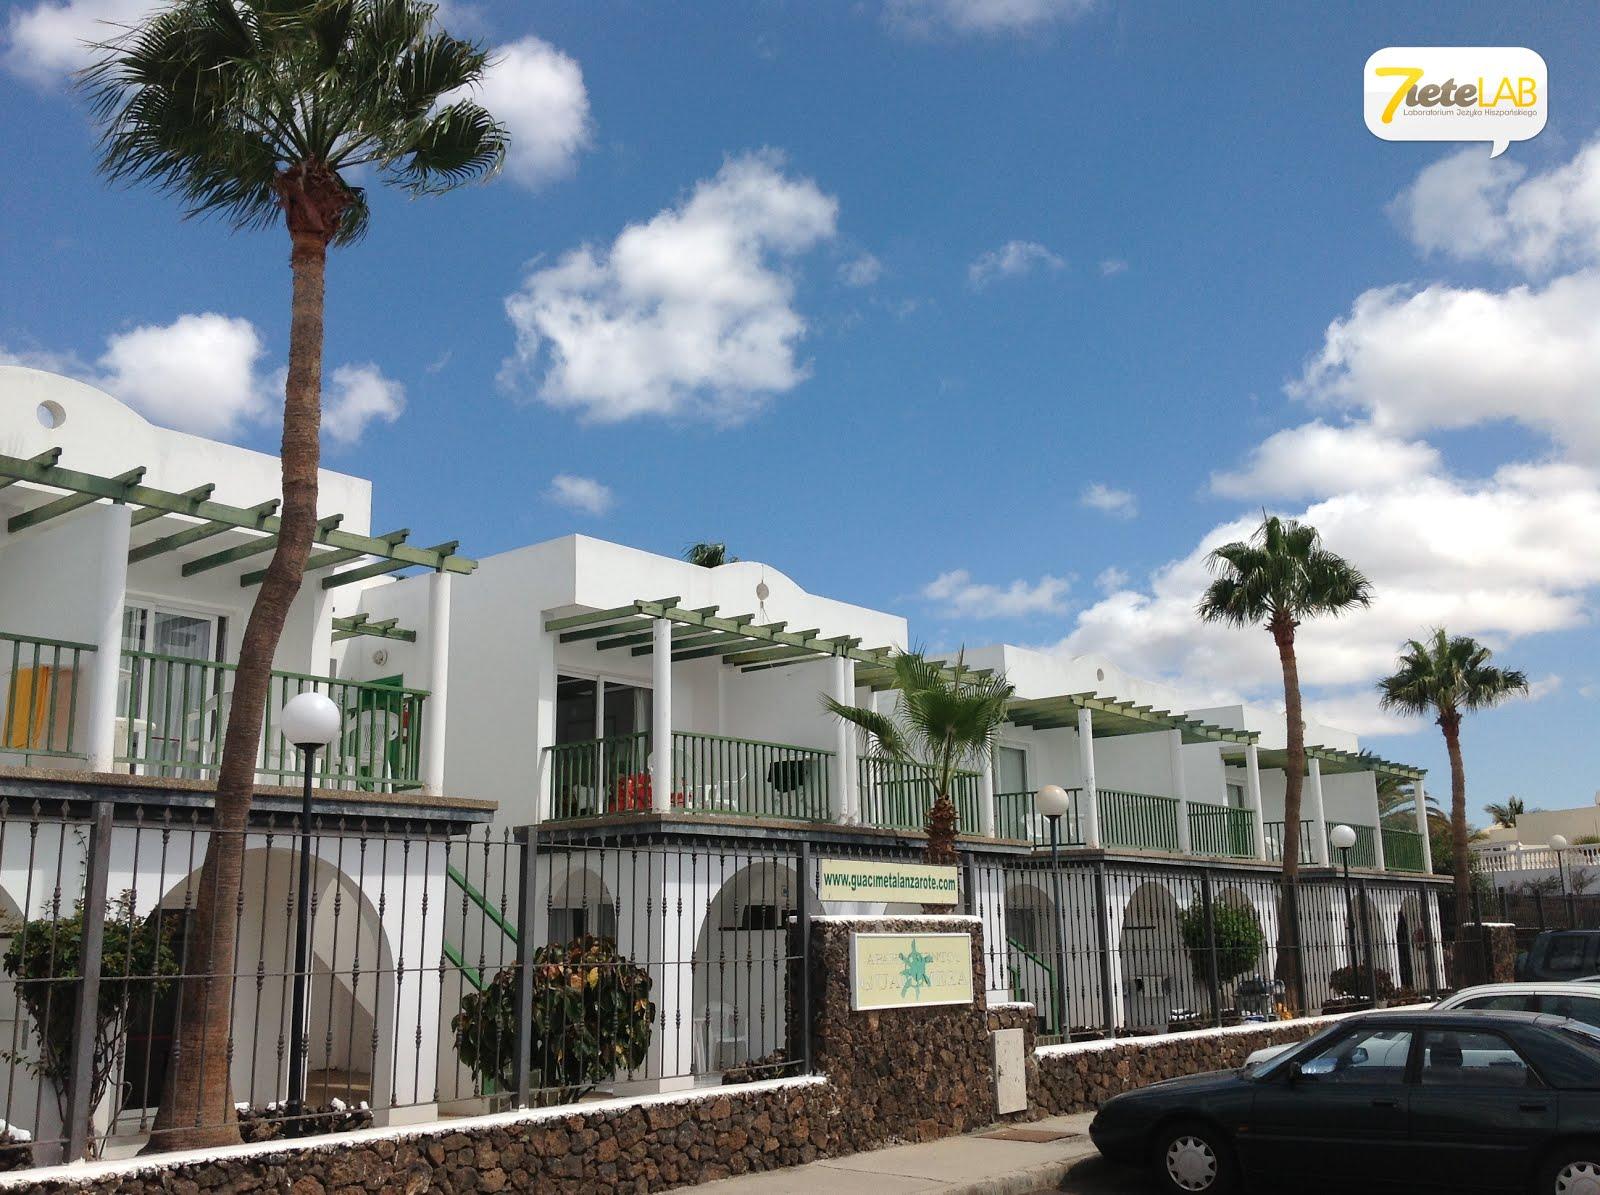 7ieteLAB español - Apartamentos Guamiceta